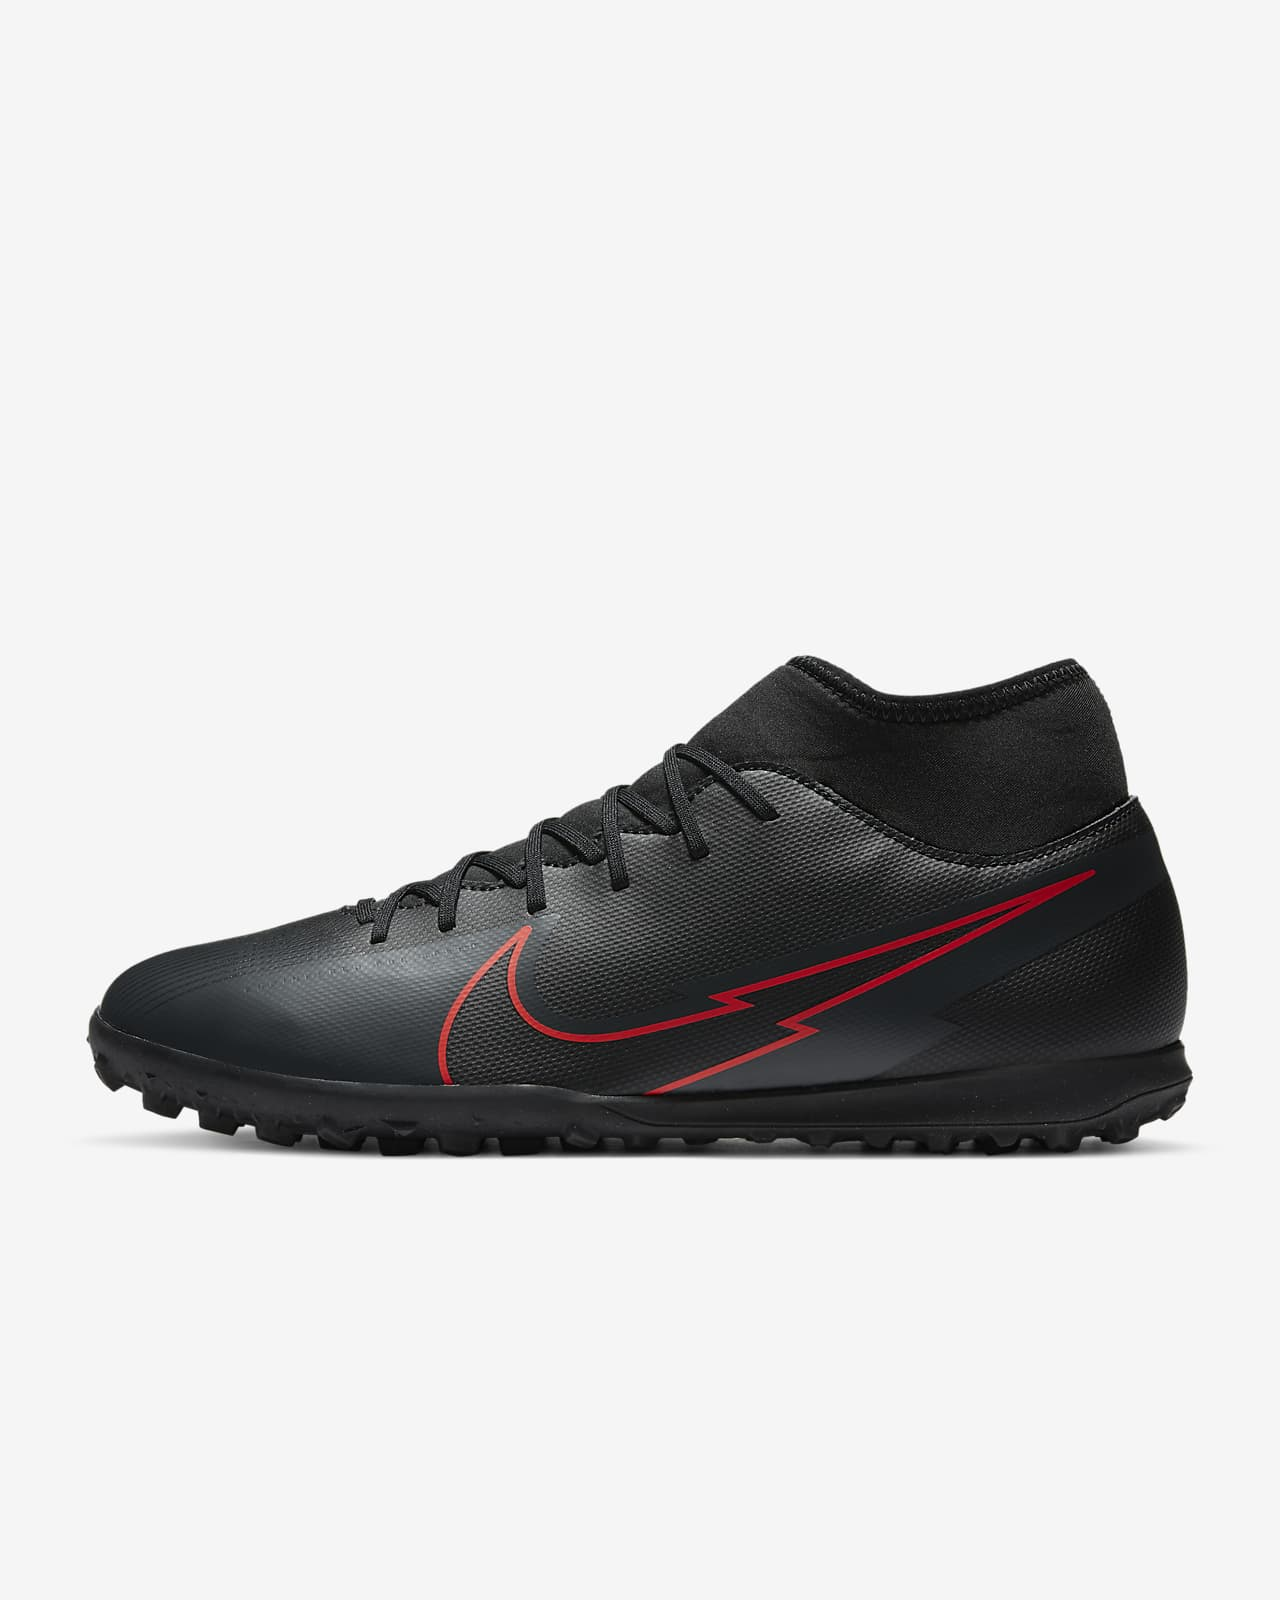 Calzado de fútbol para césped deportivo artificial (turf) Nike Mercurial Superfly 7 Club TF